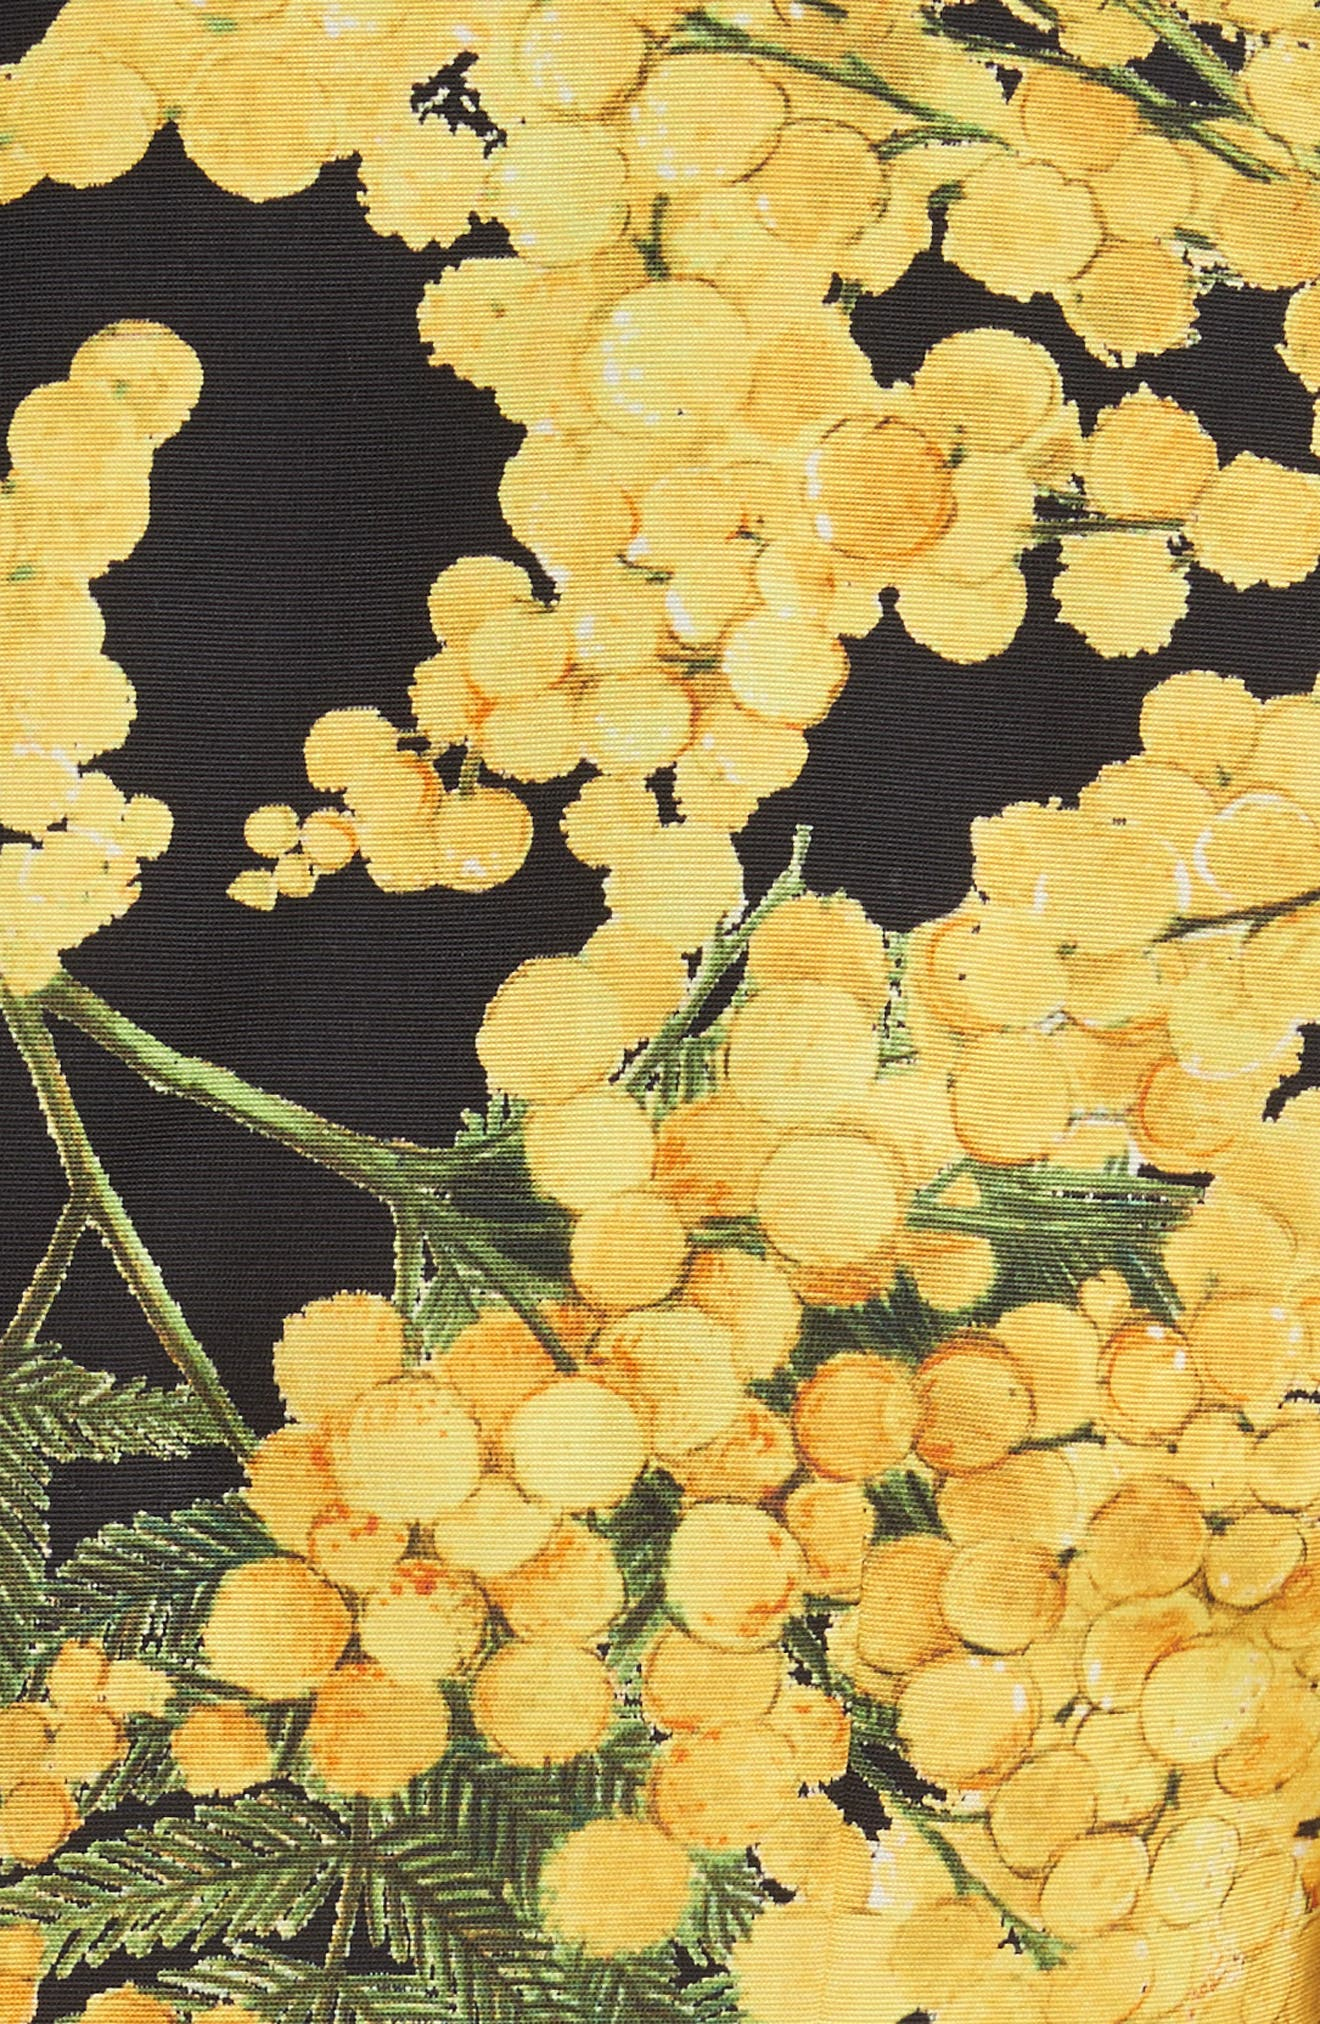 Floral Print Faille Day Dress,                             Alternate thumbnail 6, color,                             Freesia Yellow/Black